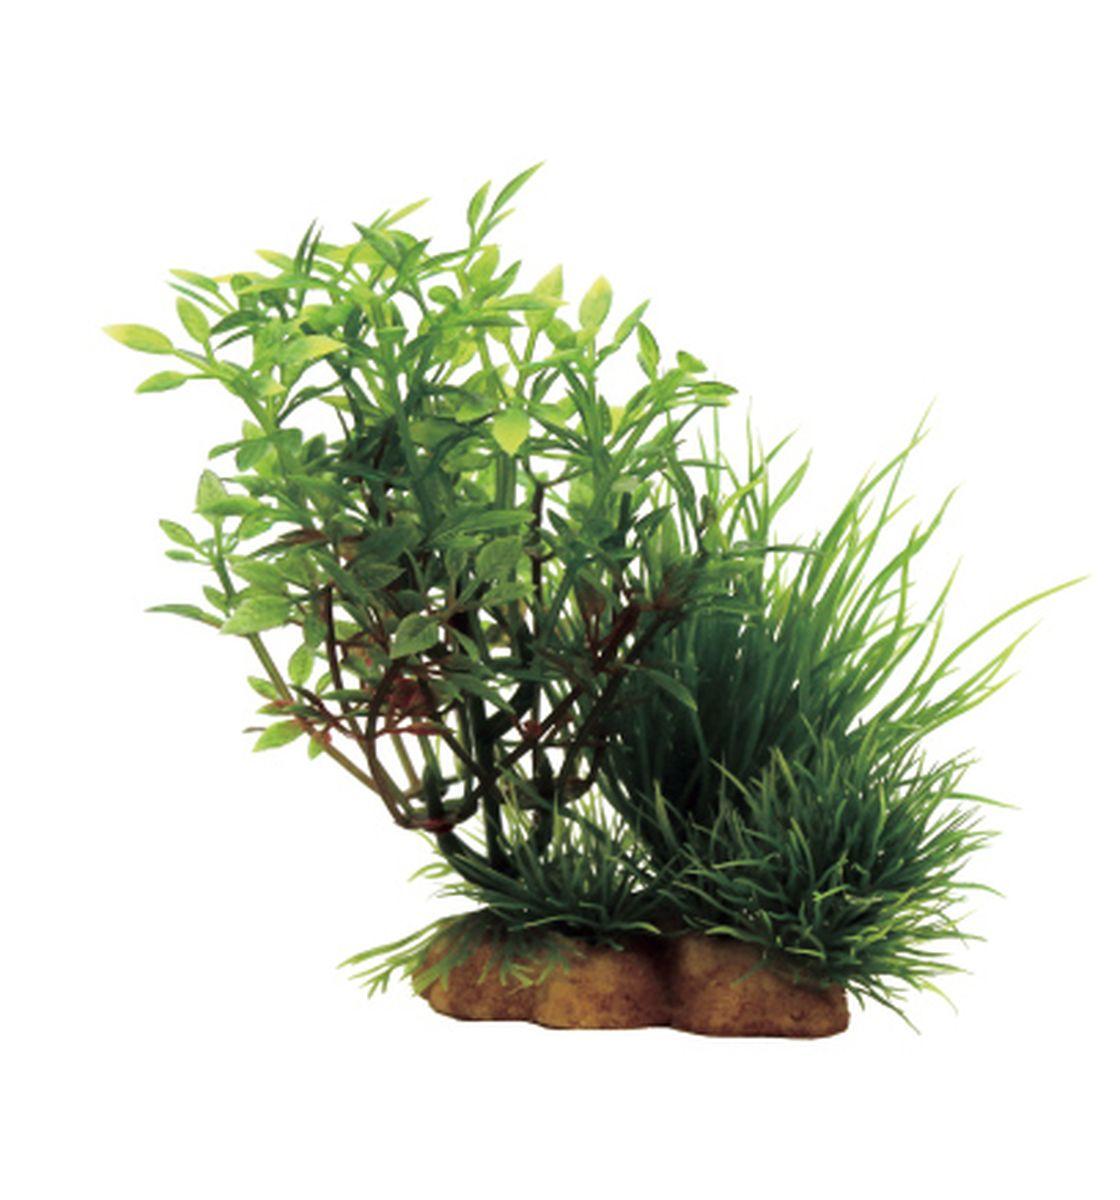 Композиция из растений для аквариума ArtUniq Микрантемум, 12 x 5 x 12 смART-1130907Композиция из растений для аквариума ArtUniq Микрантемум, 12 x 5 x 12 см